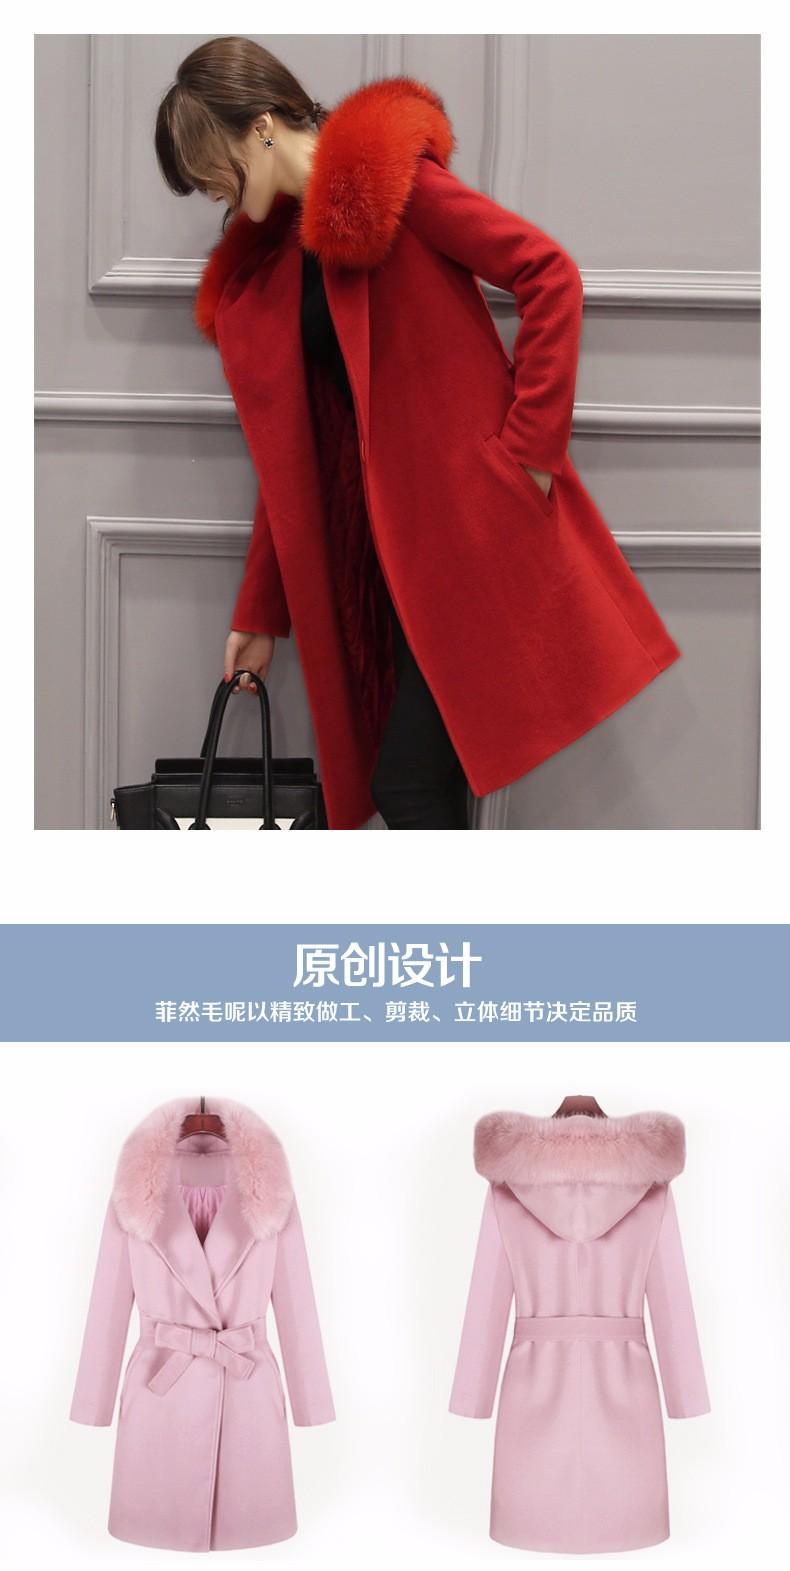 Europe United States Autumn/winter 2016New Female Temperament Wool Coat Fashion Big Yards Cultivate One's Morality  Jacket Coat